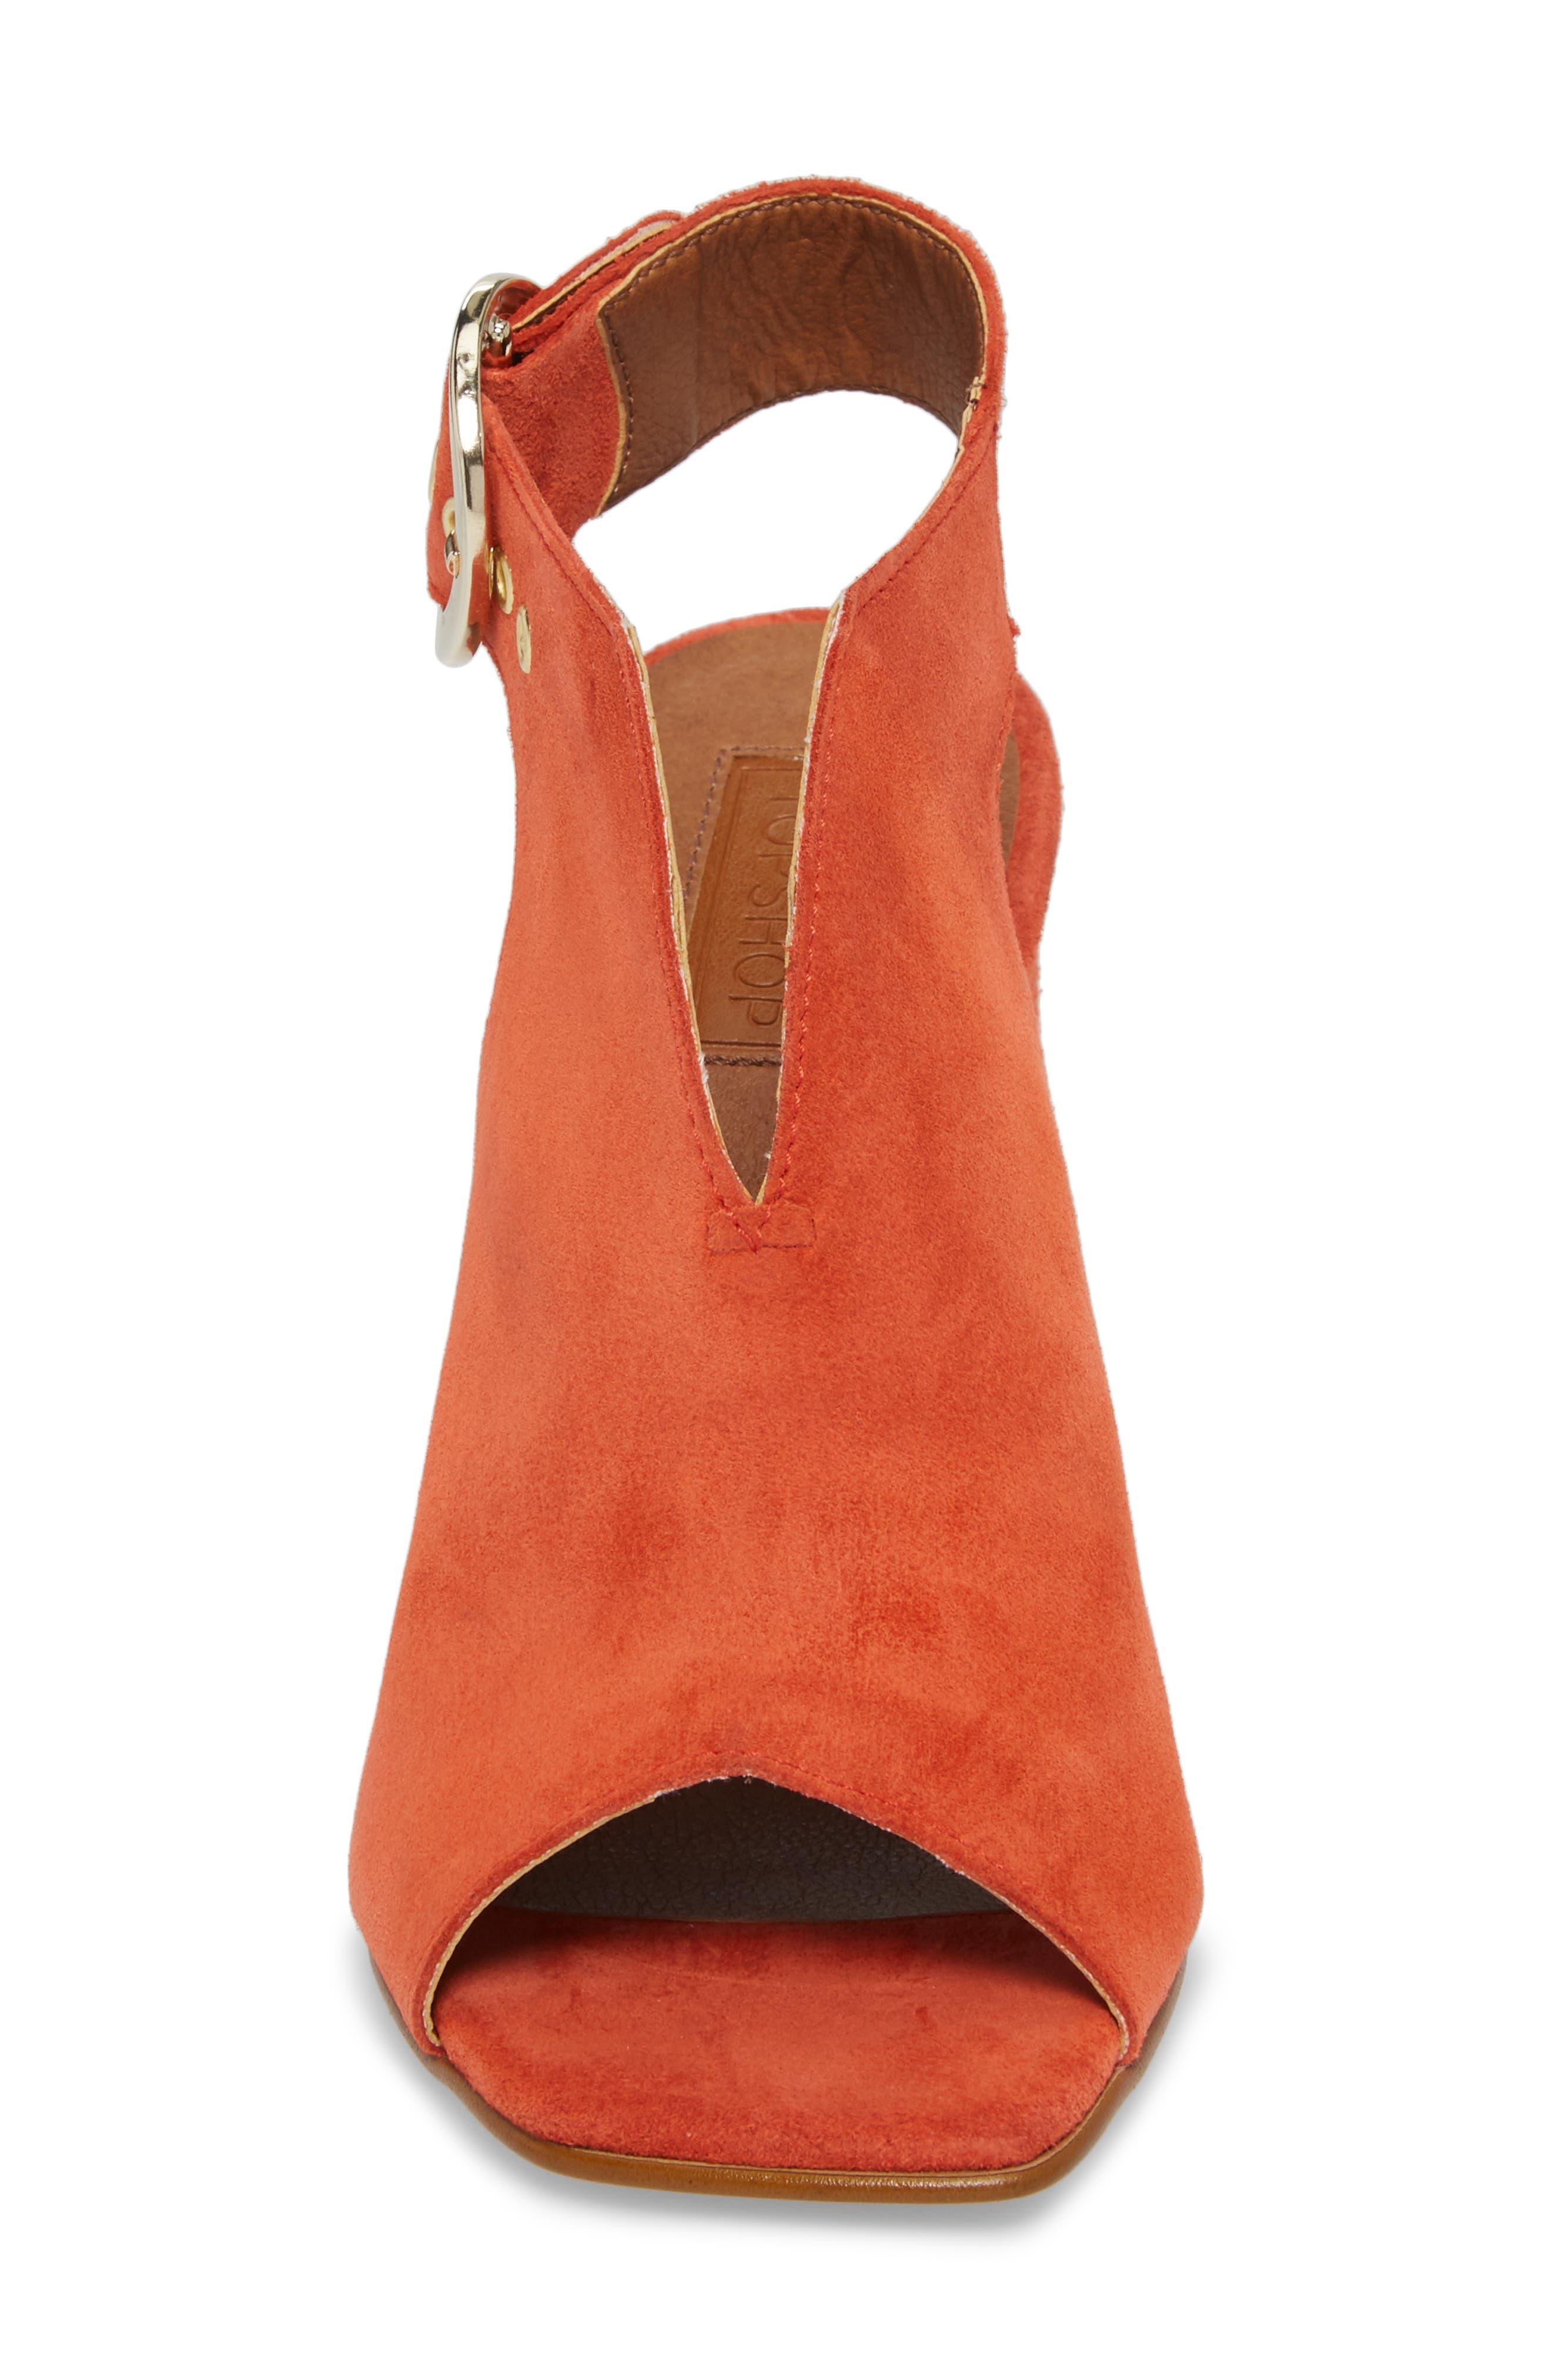 Nika Flared Heel Slingback Sandal,                             Alternate thumbnail 4, color,                             Orange